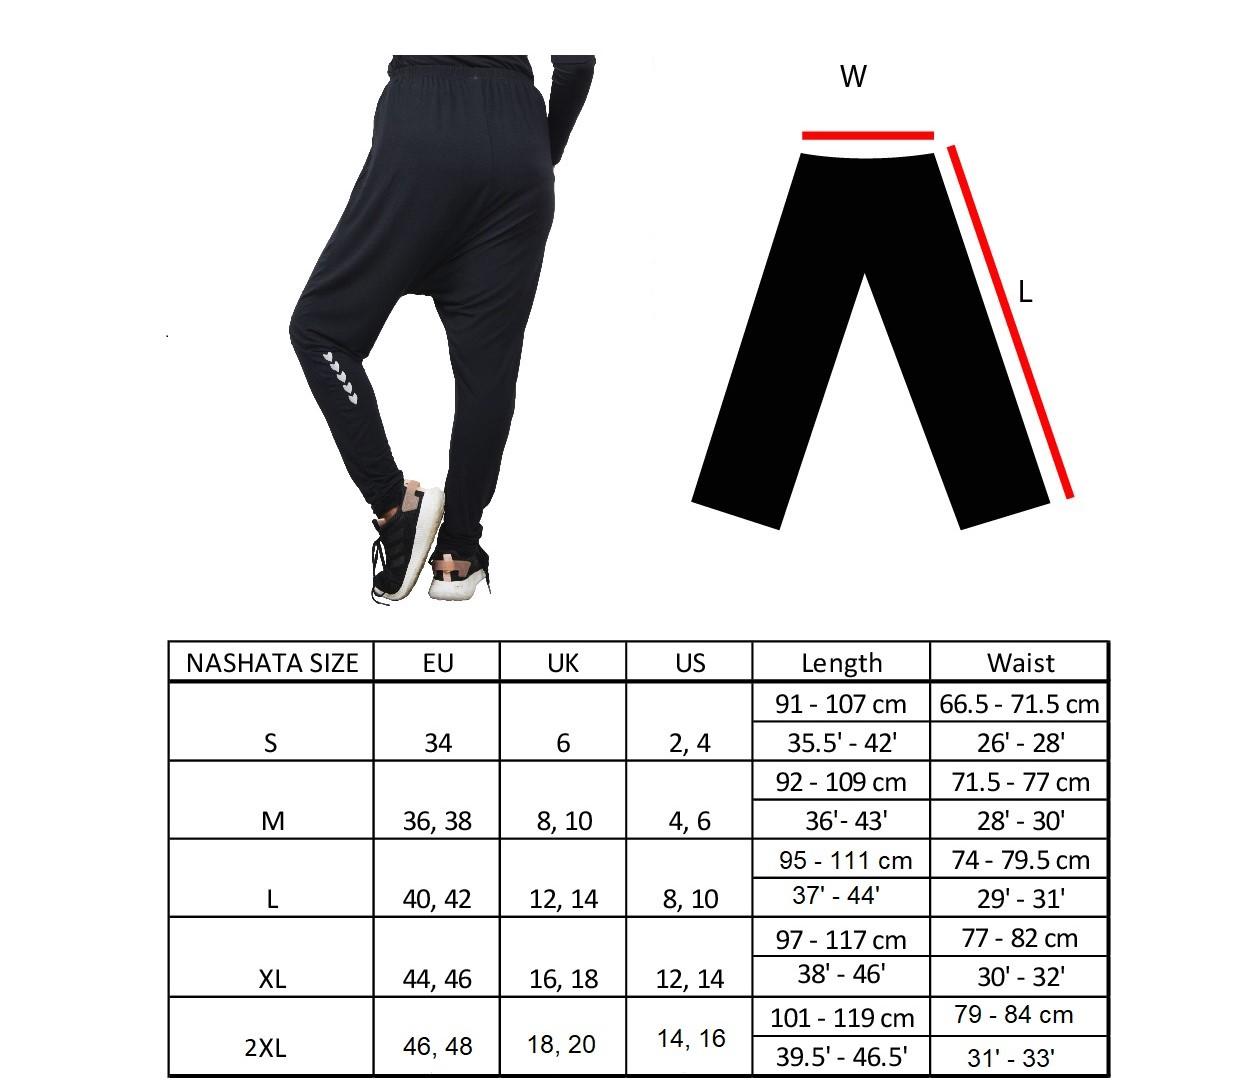 Harem pants size chart nashata